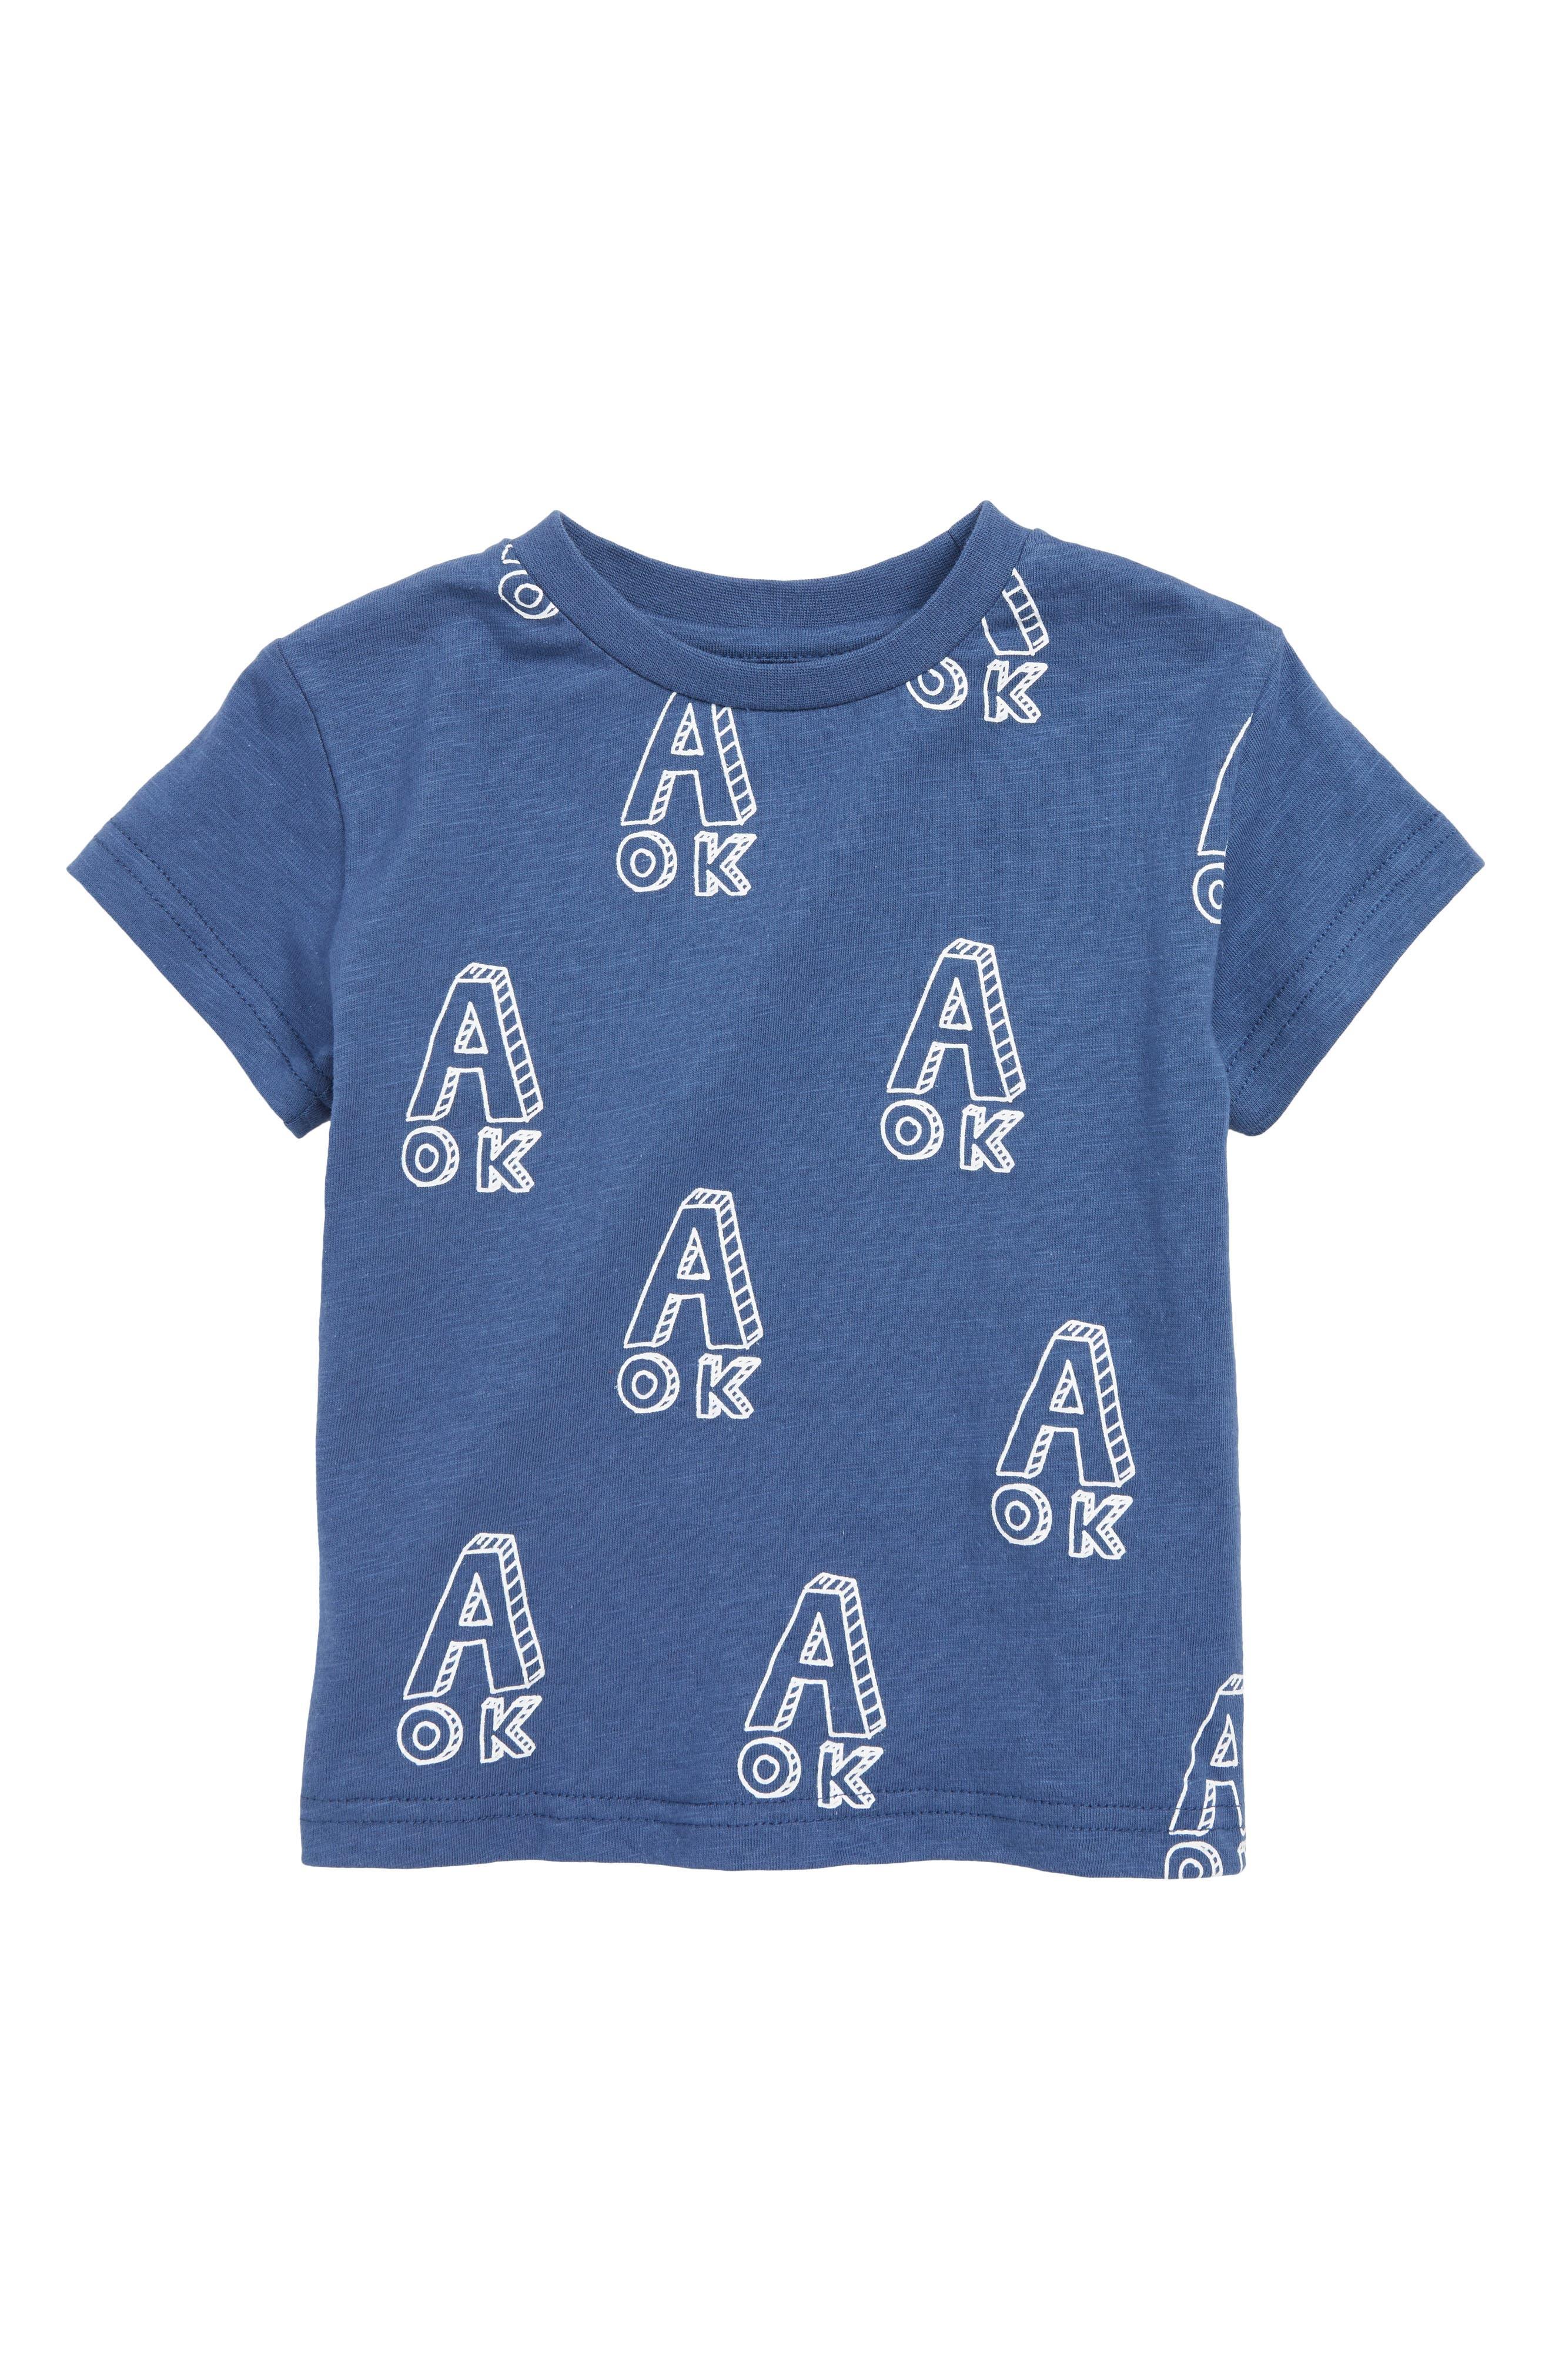 TINY TRIBE A OK Print T-Shirt, Main, color, NAVY